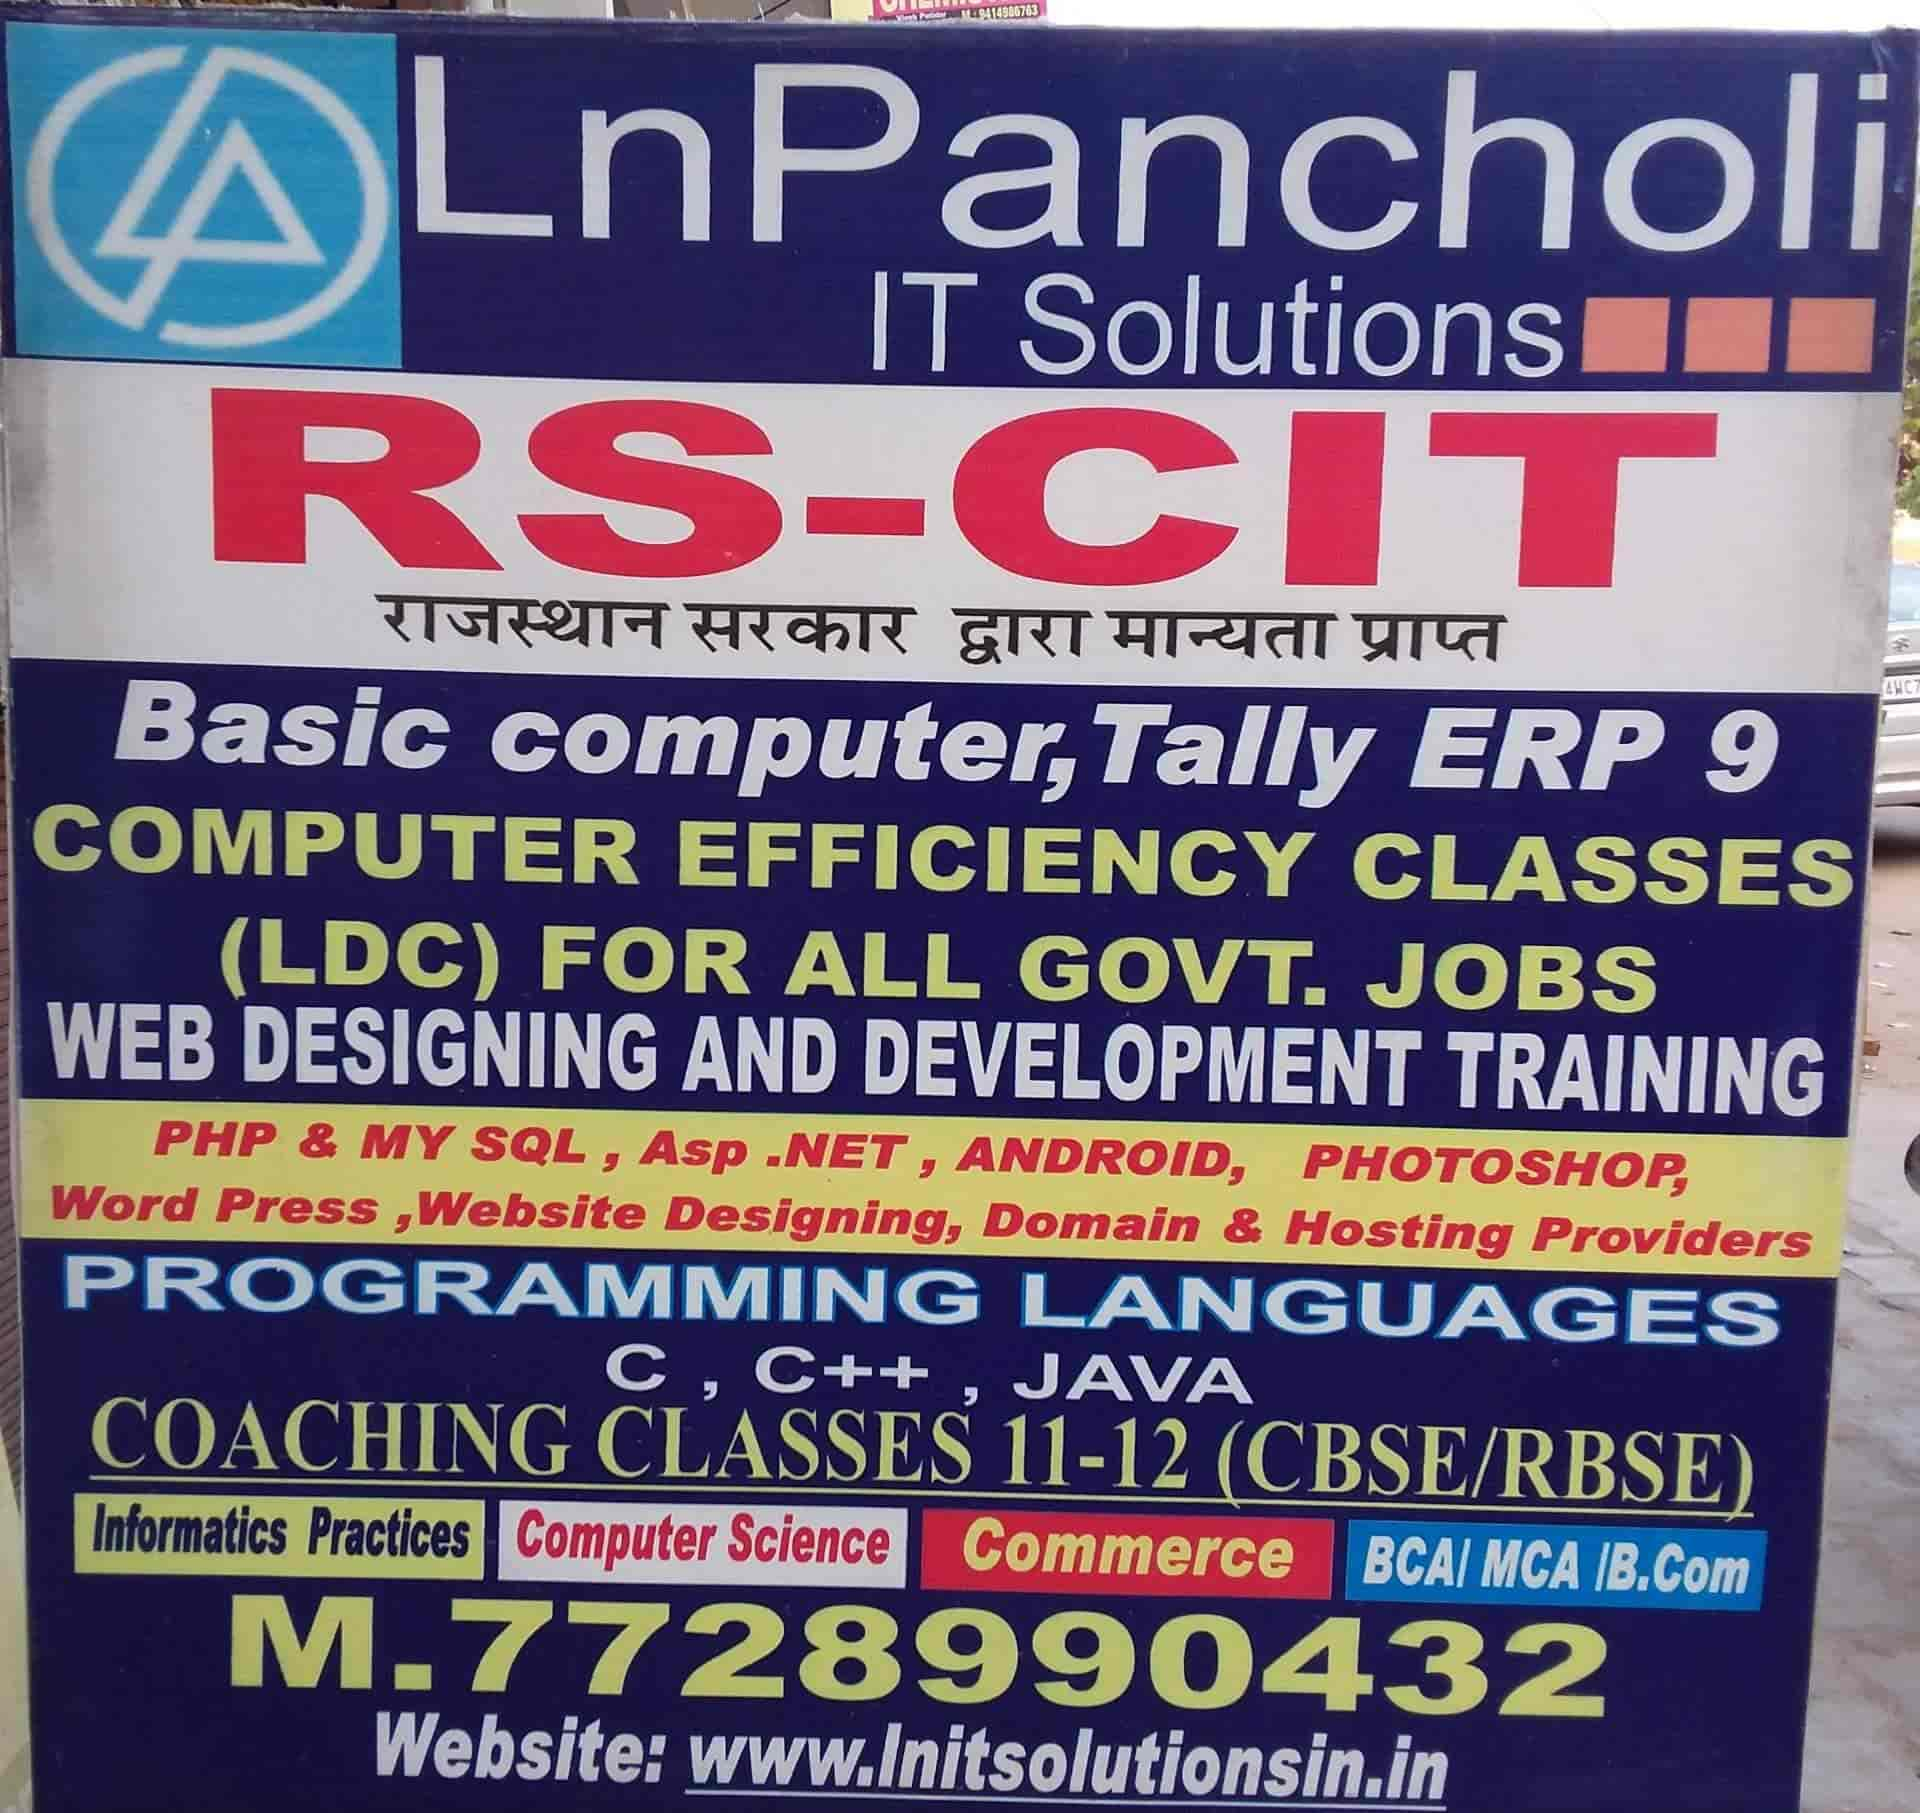 LN Pancholi IT Solutions Photos, Gopalpura Bypass, Jaipur- Pictures